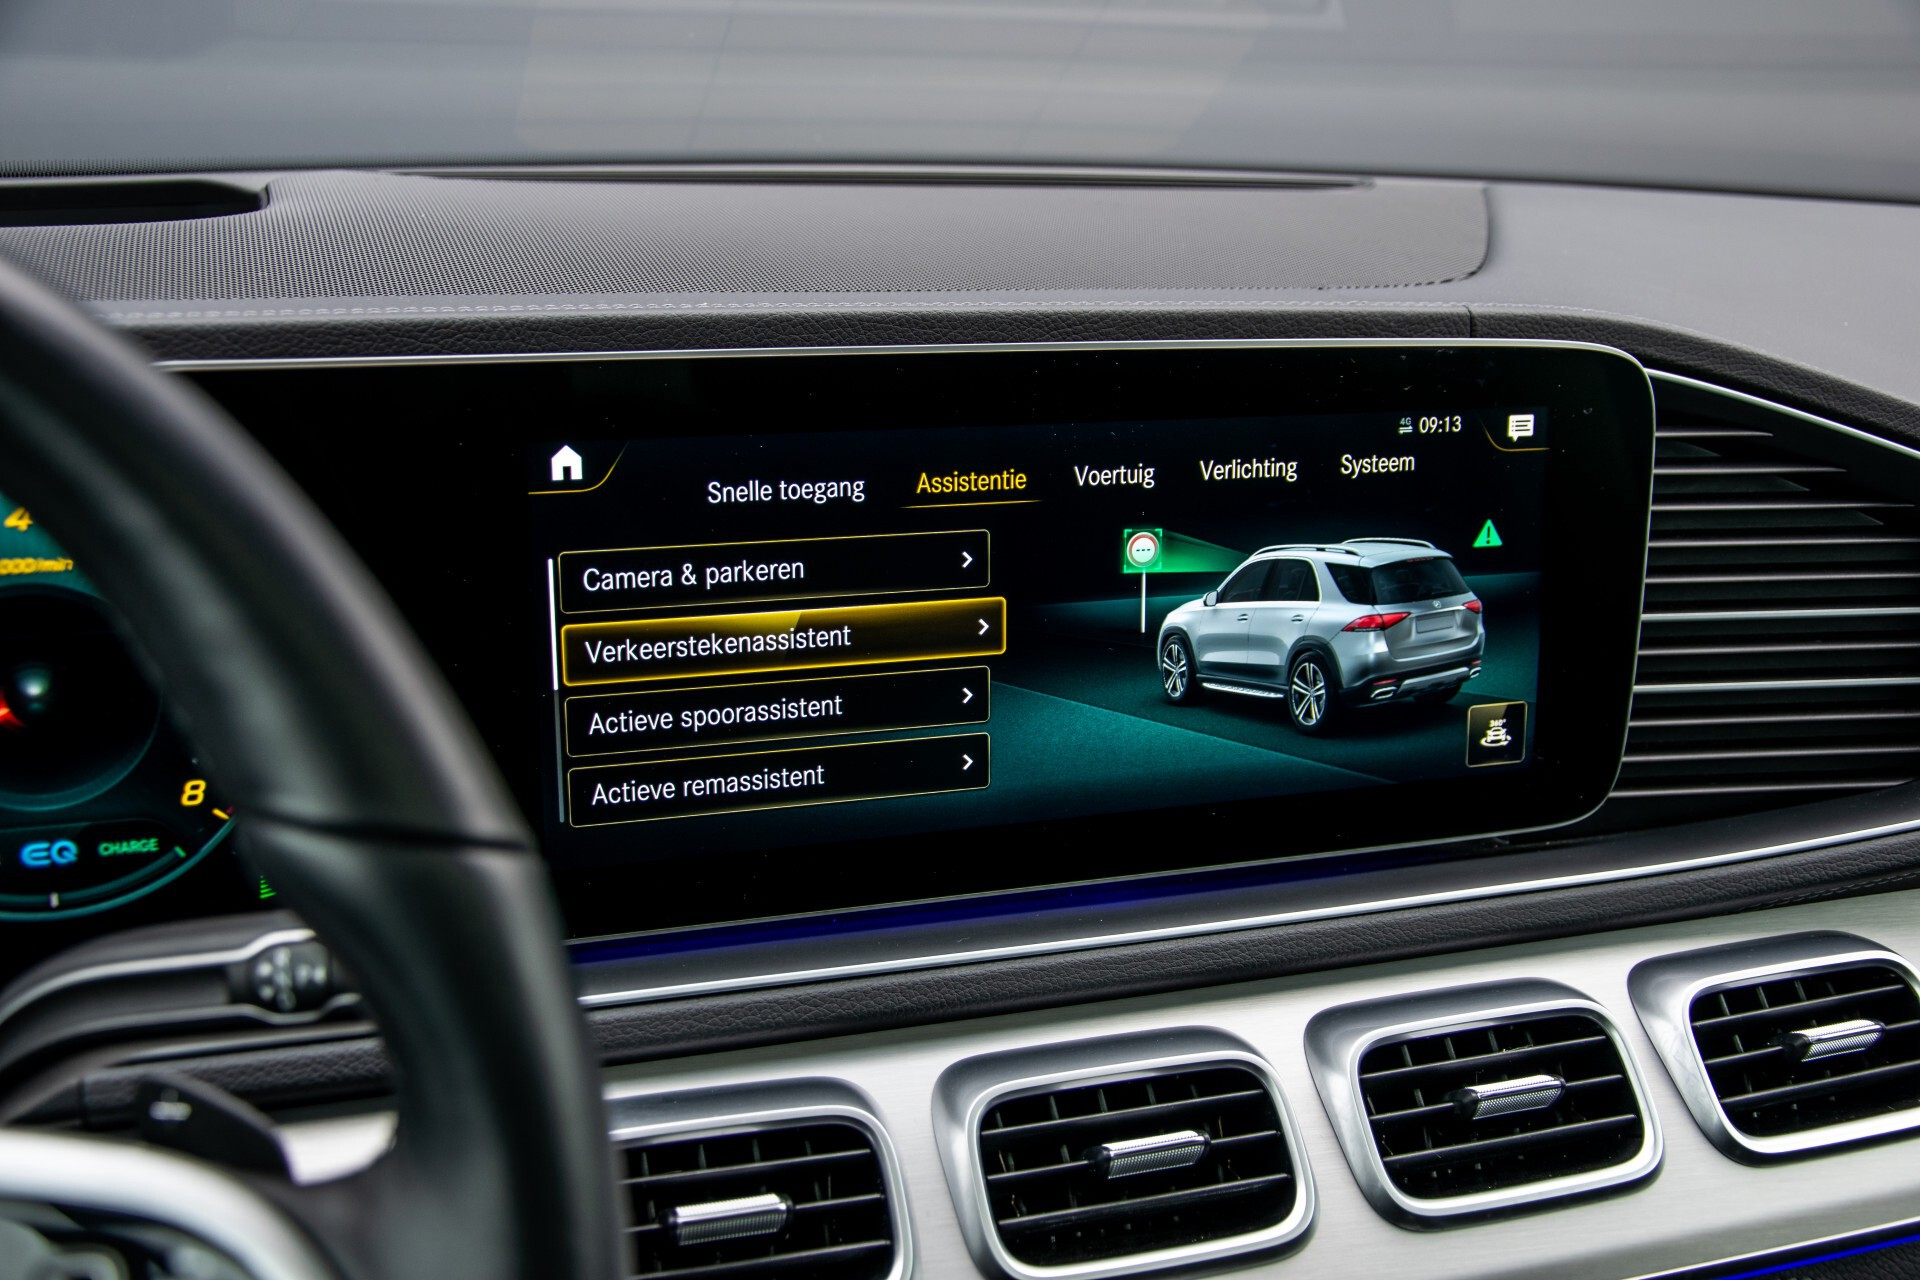 Mercedes-Benz GLE 450 4-M 7-Persoons AMG Massage/Rij-assist/Keyless/TV/360/Night/Trekhaak Aut9 Foto 30